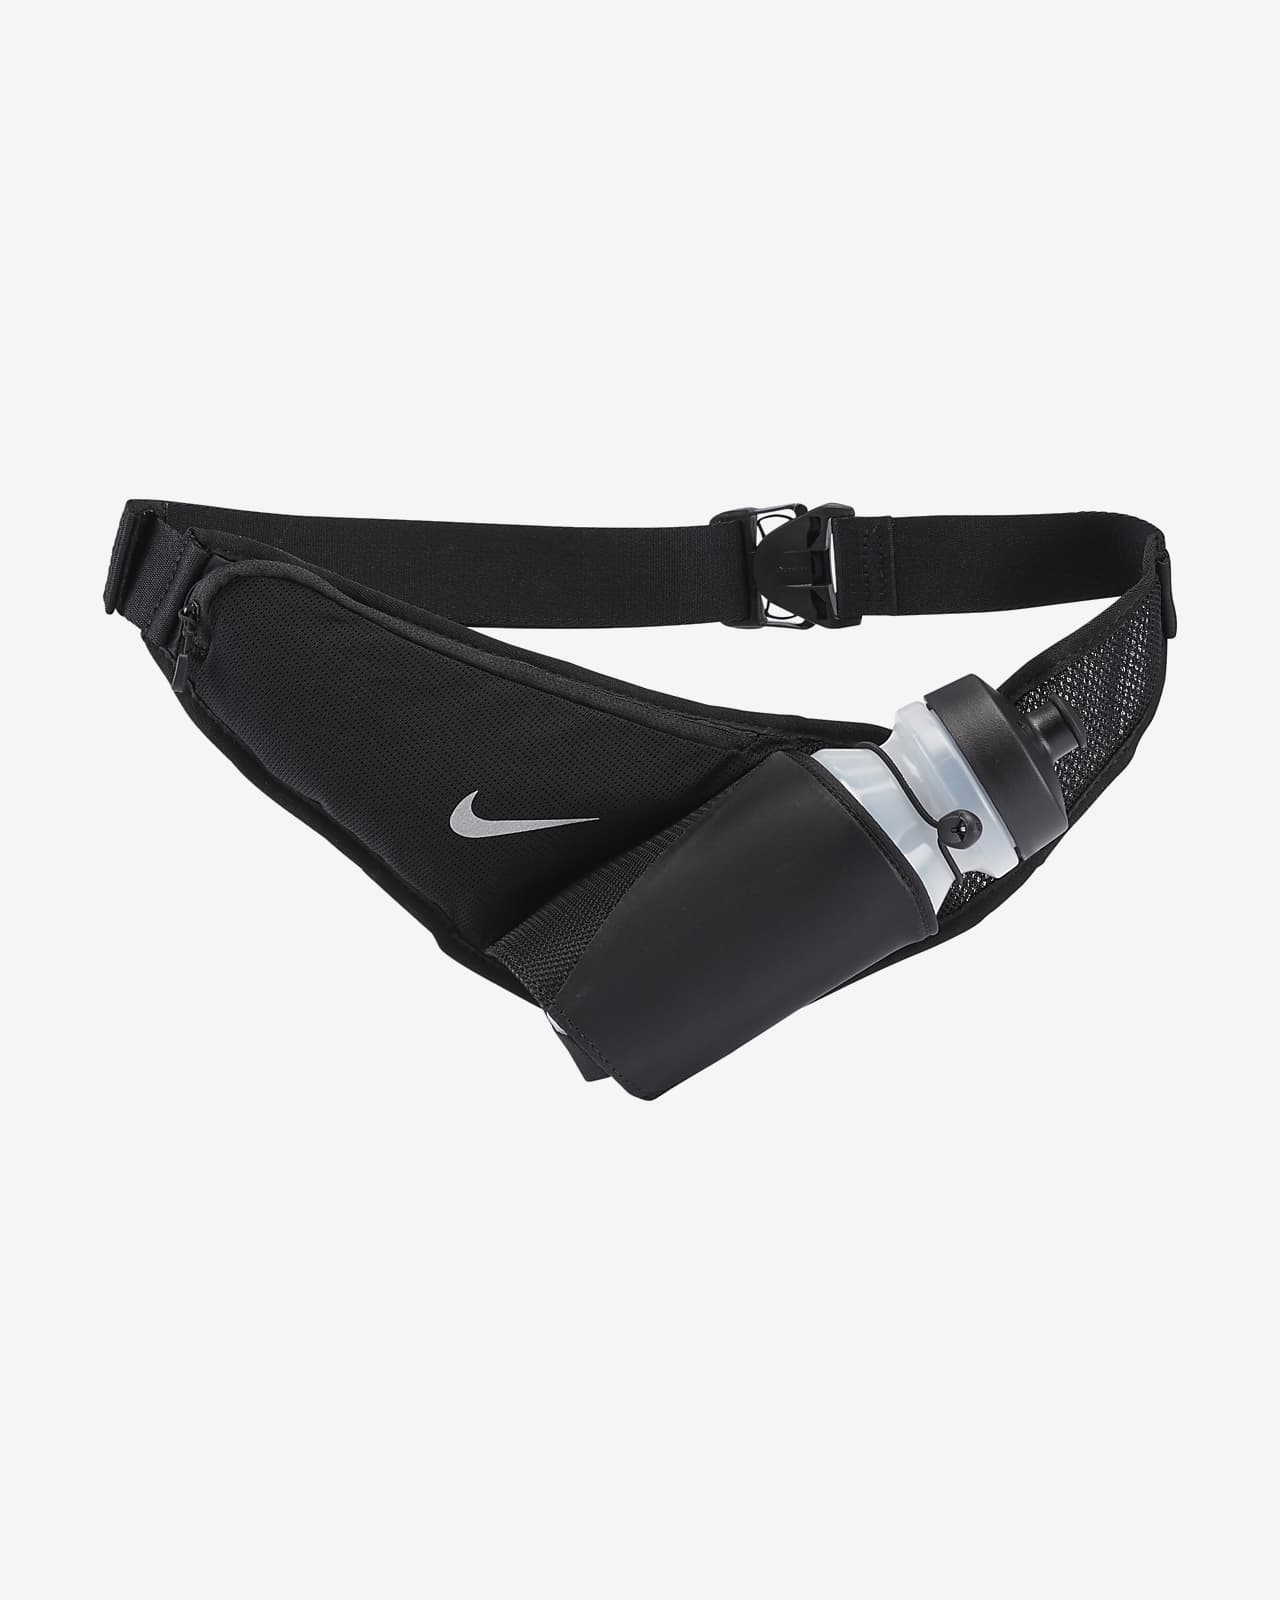 Nike 22oz Large Bottle Running Belt